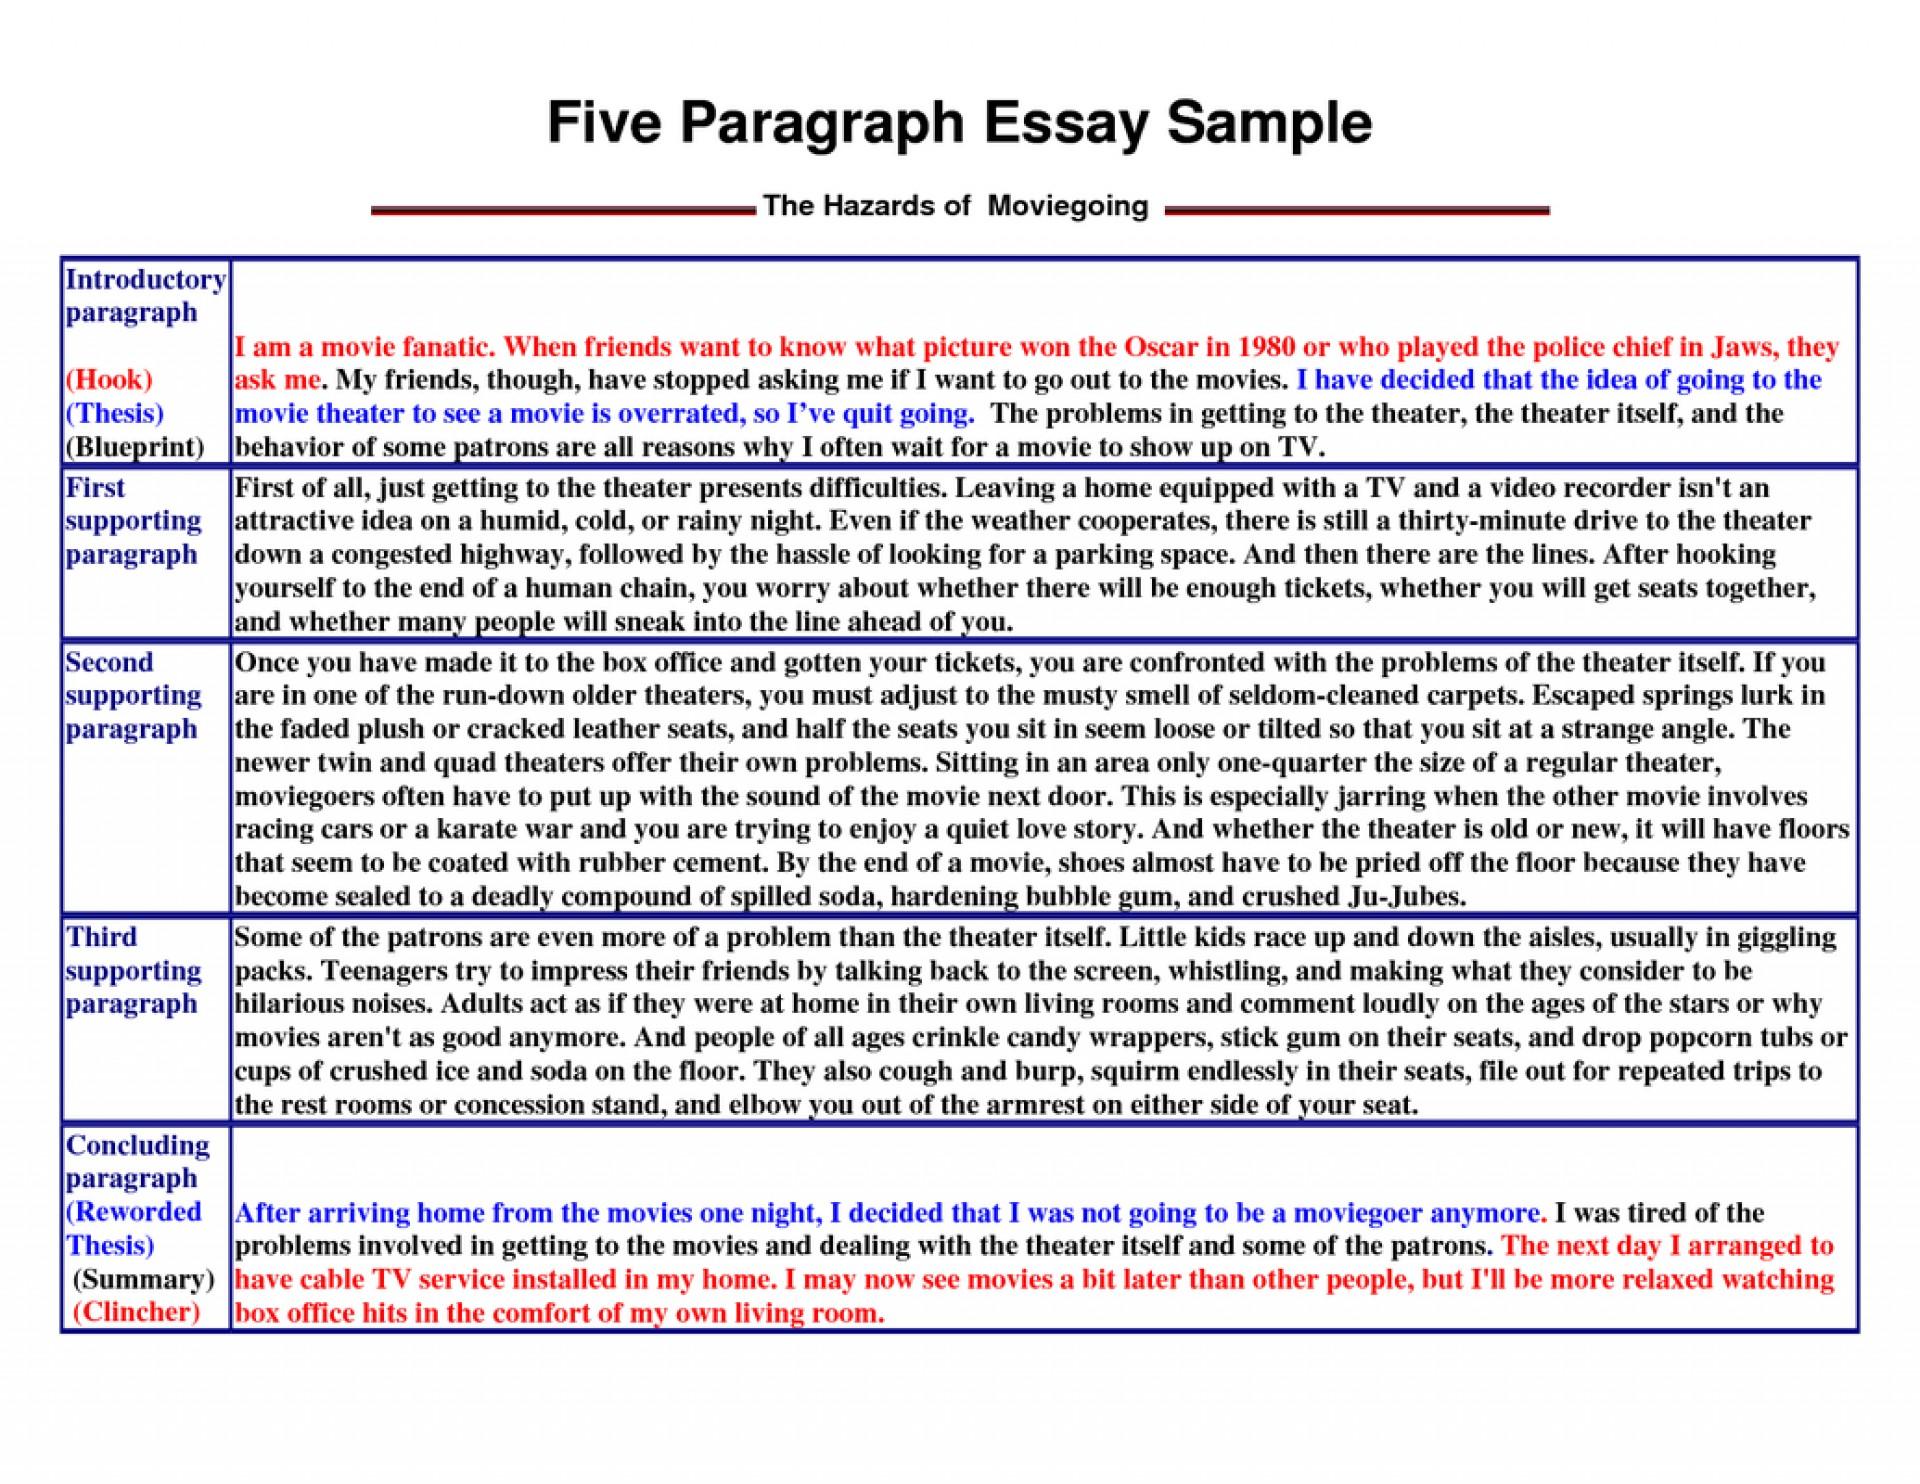 003 Essay Introduction Paragraph Example 7897635 Orig Stupendous Literary Argumentative Sample 1920